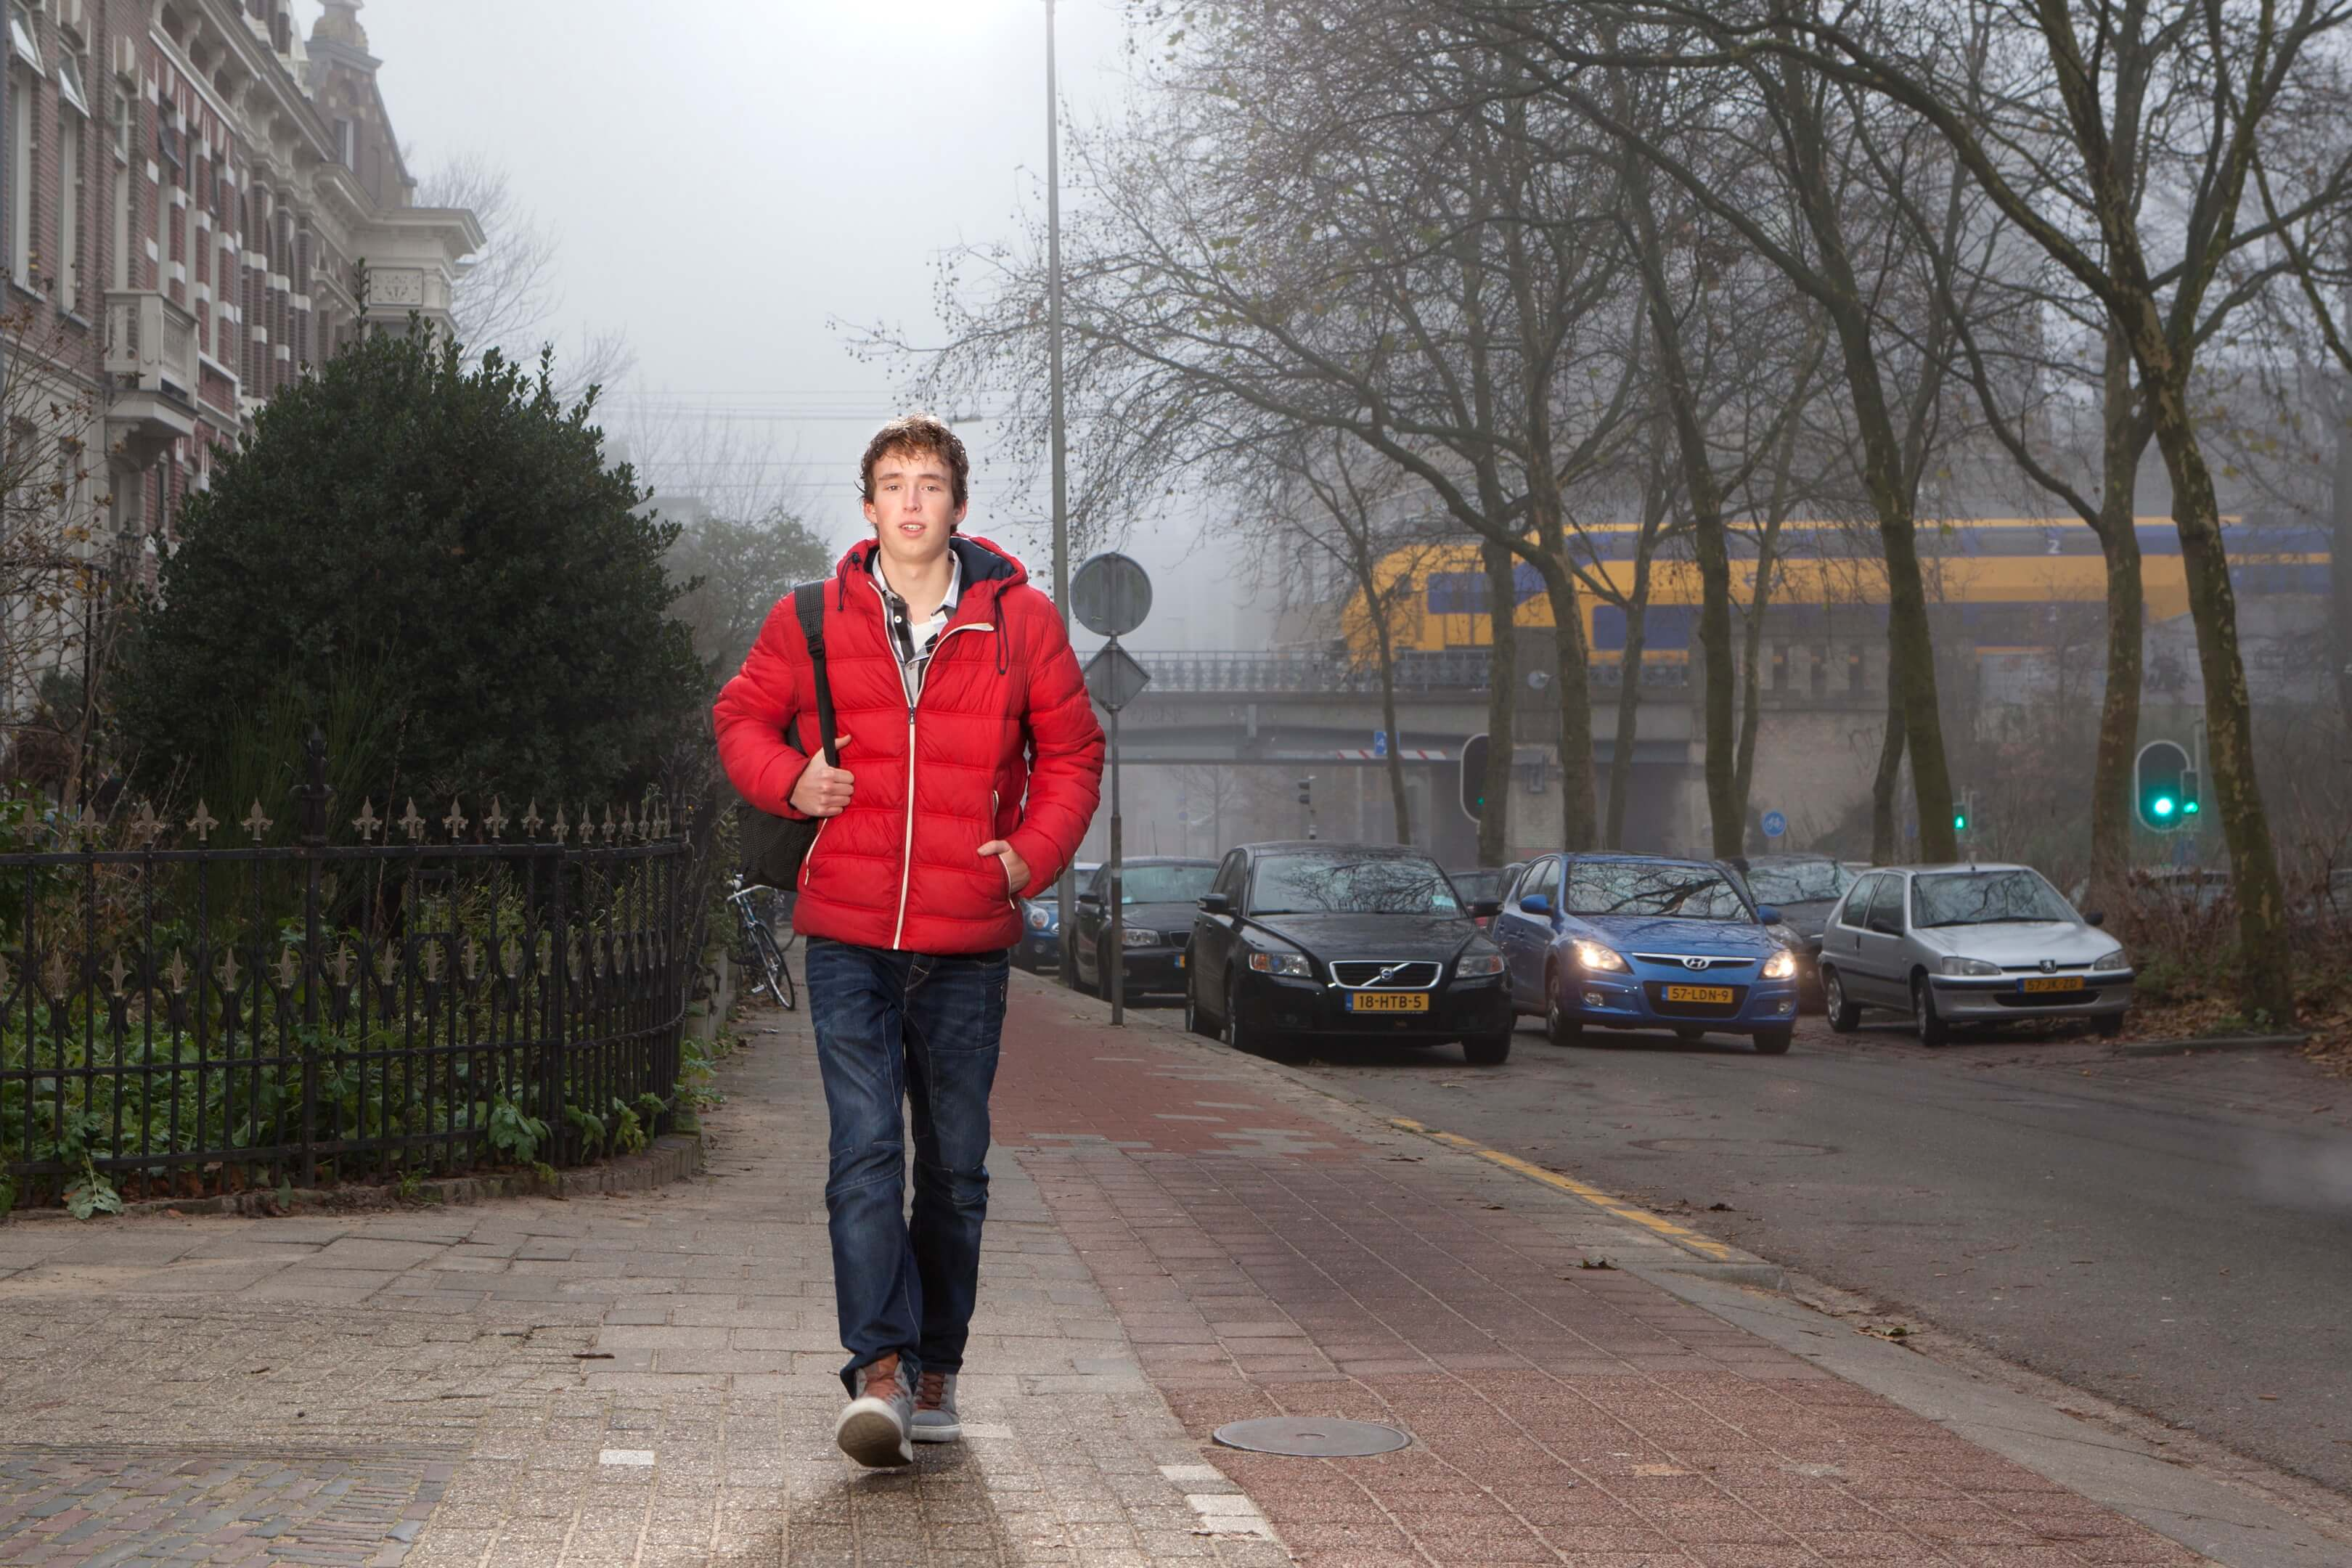 Gemeente Arnhem Jurjen Poeles fotografie project fotografie Vastgoedplein Nijhoffstraat portret sint Marten omgevingsportret Apeldoornseweg